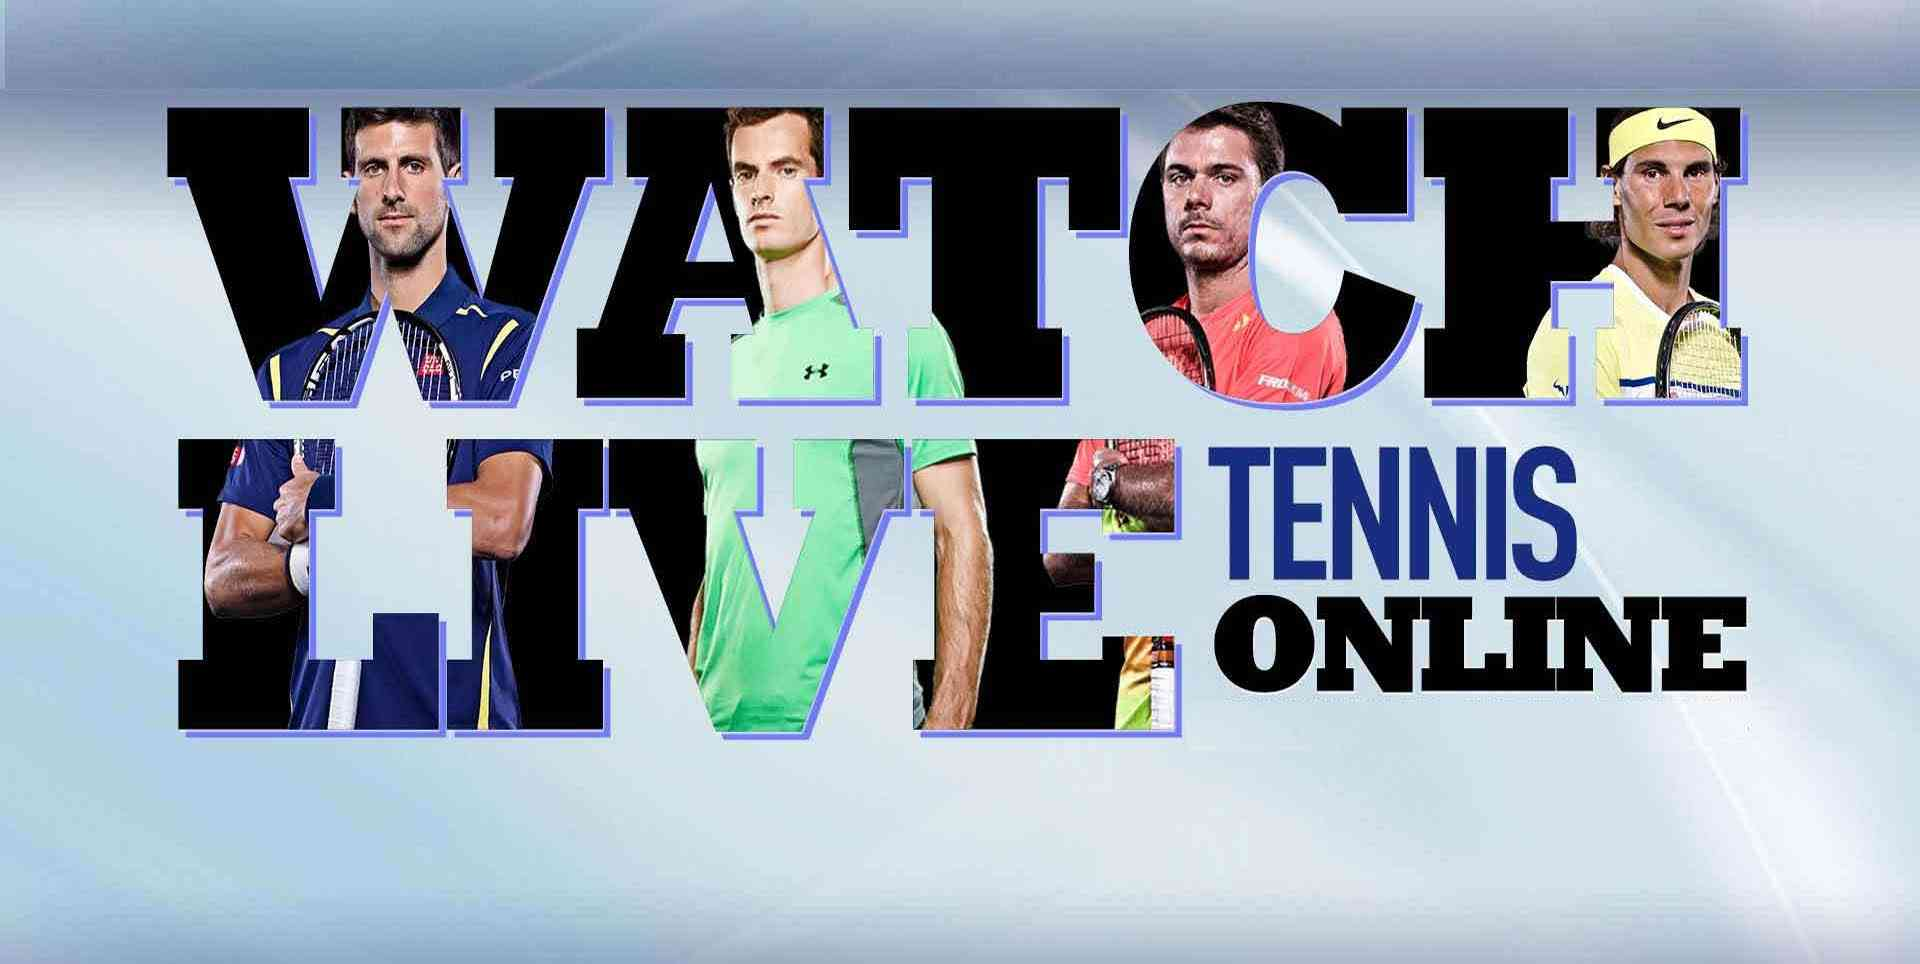 Watch 2nd Round P. Kvitova vs M. Erakovic live